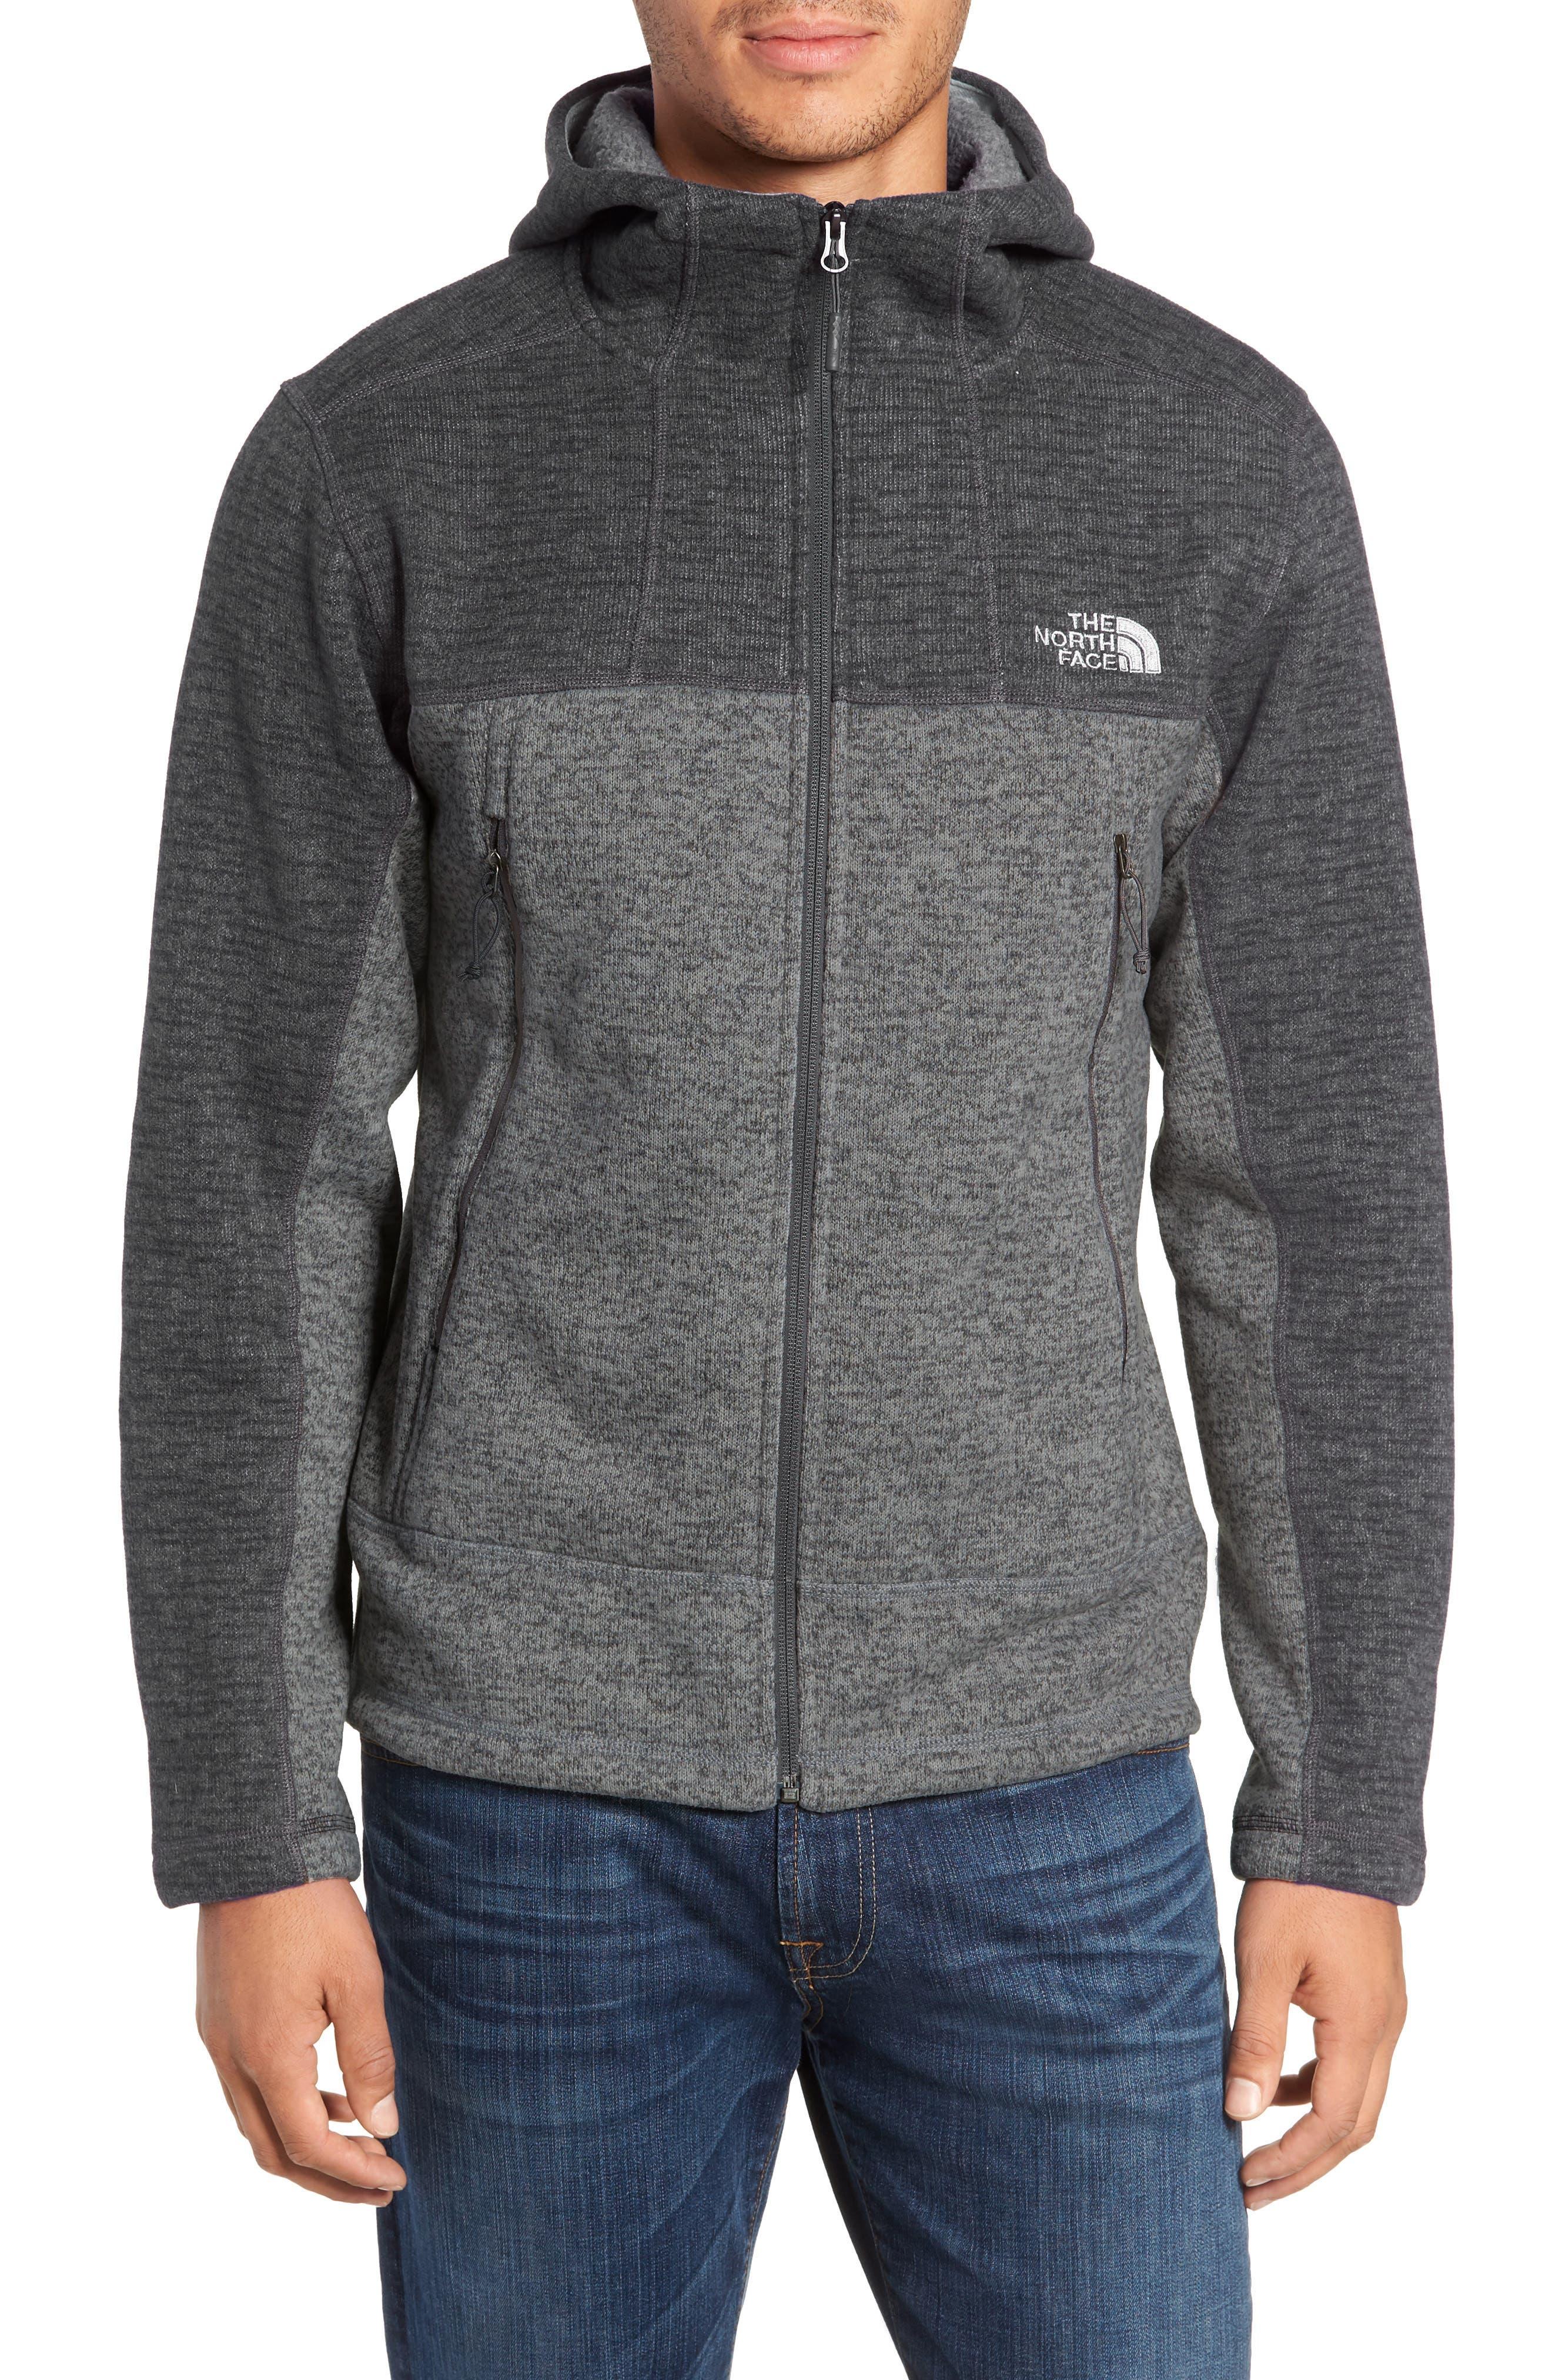 Gordon Lyons Alpine Sweater Fleece Hoodie,                             Main thumbnail 1, color,                             ASPHALT GREY/ MONUMENT GREY